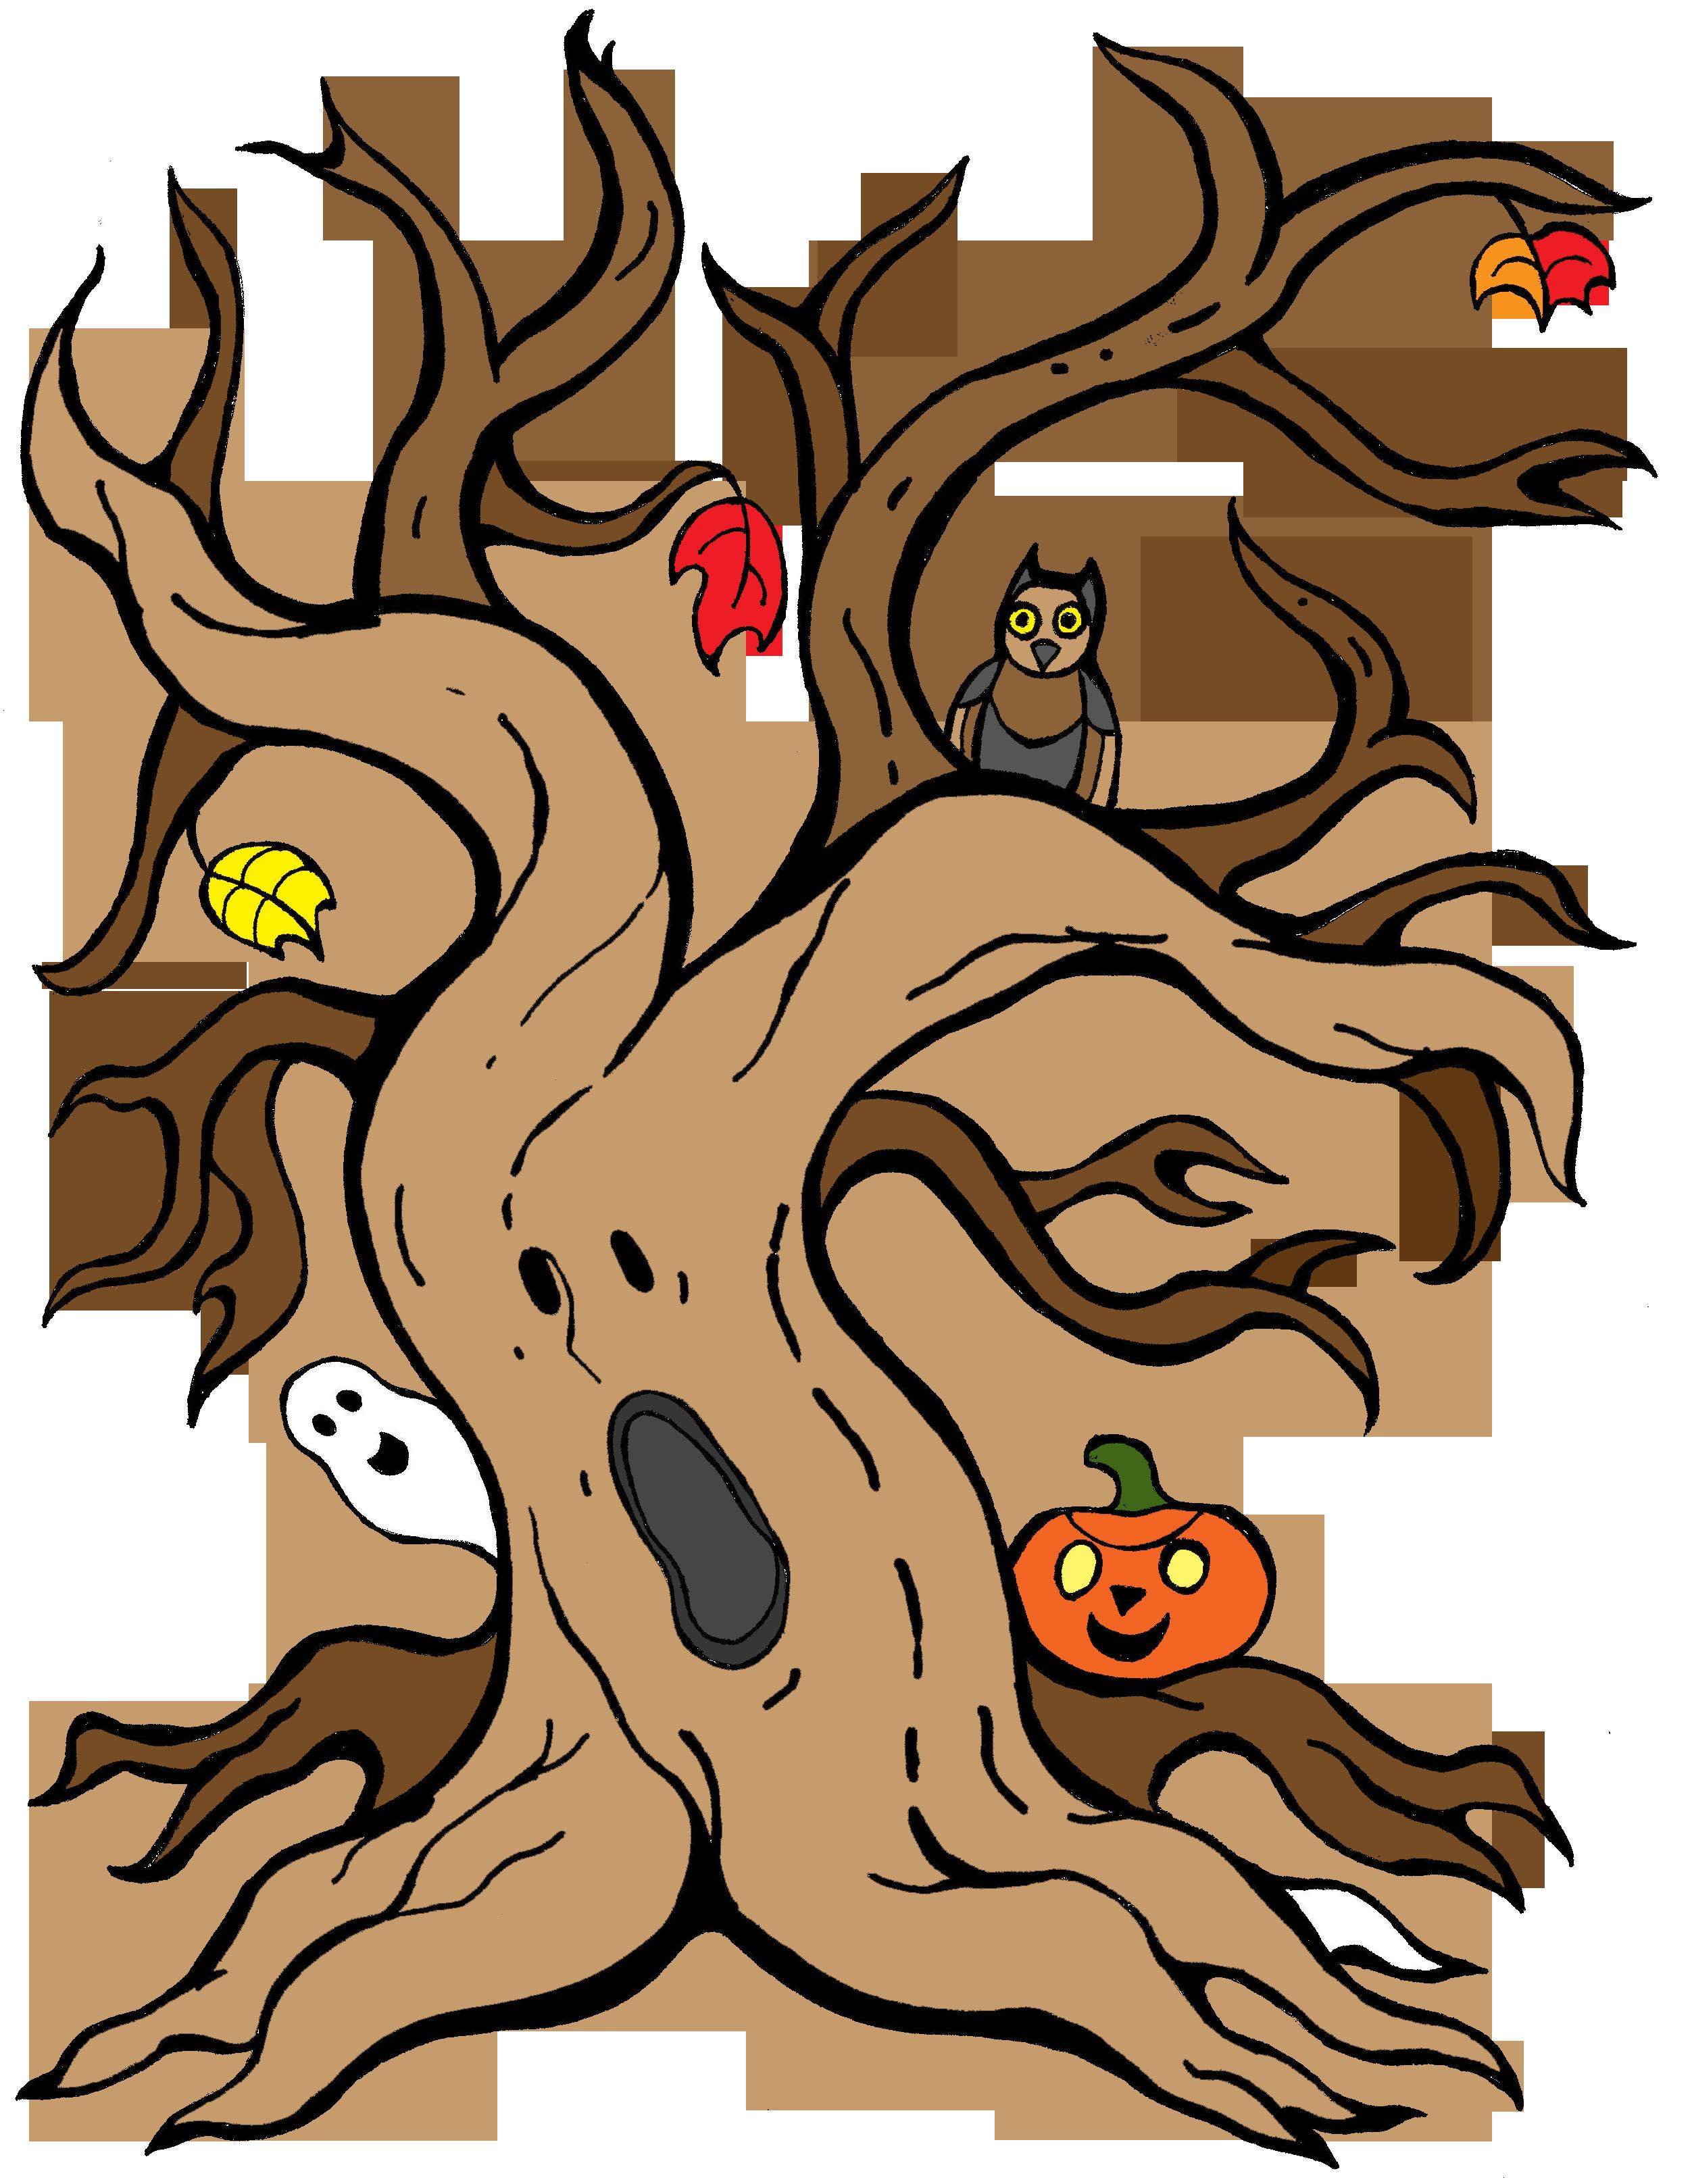 Fun and spooky Halloween tree. Halloween trees, Spooky